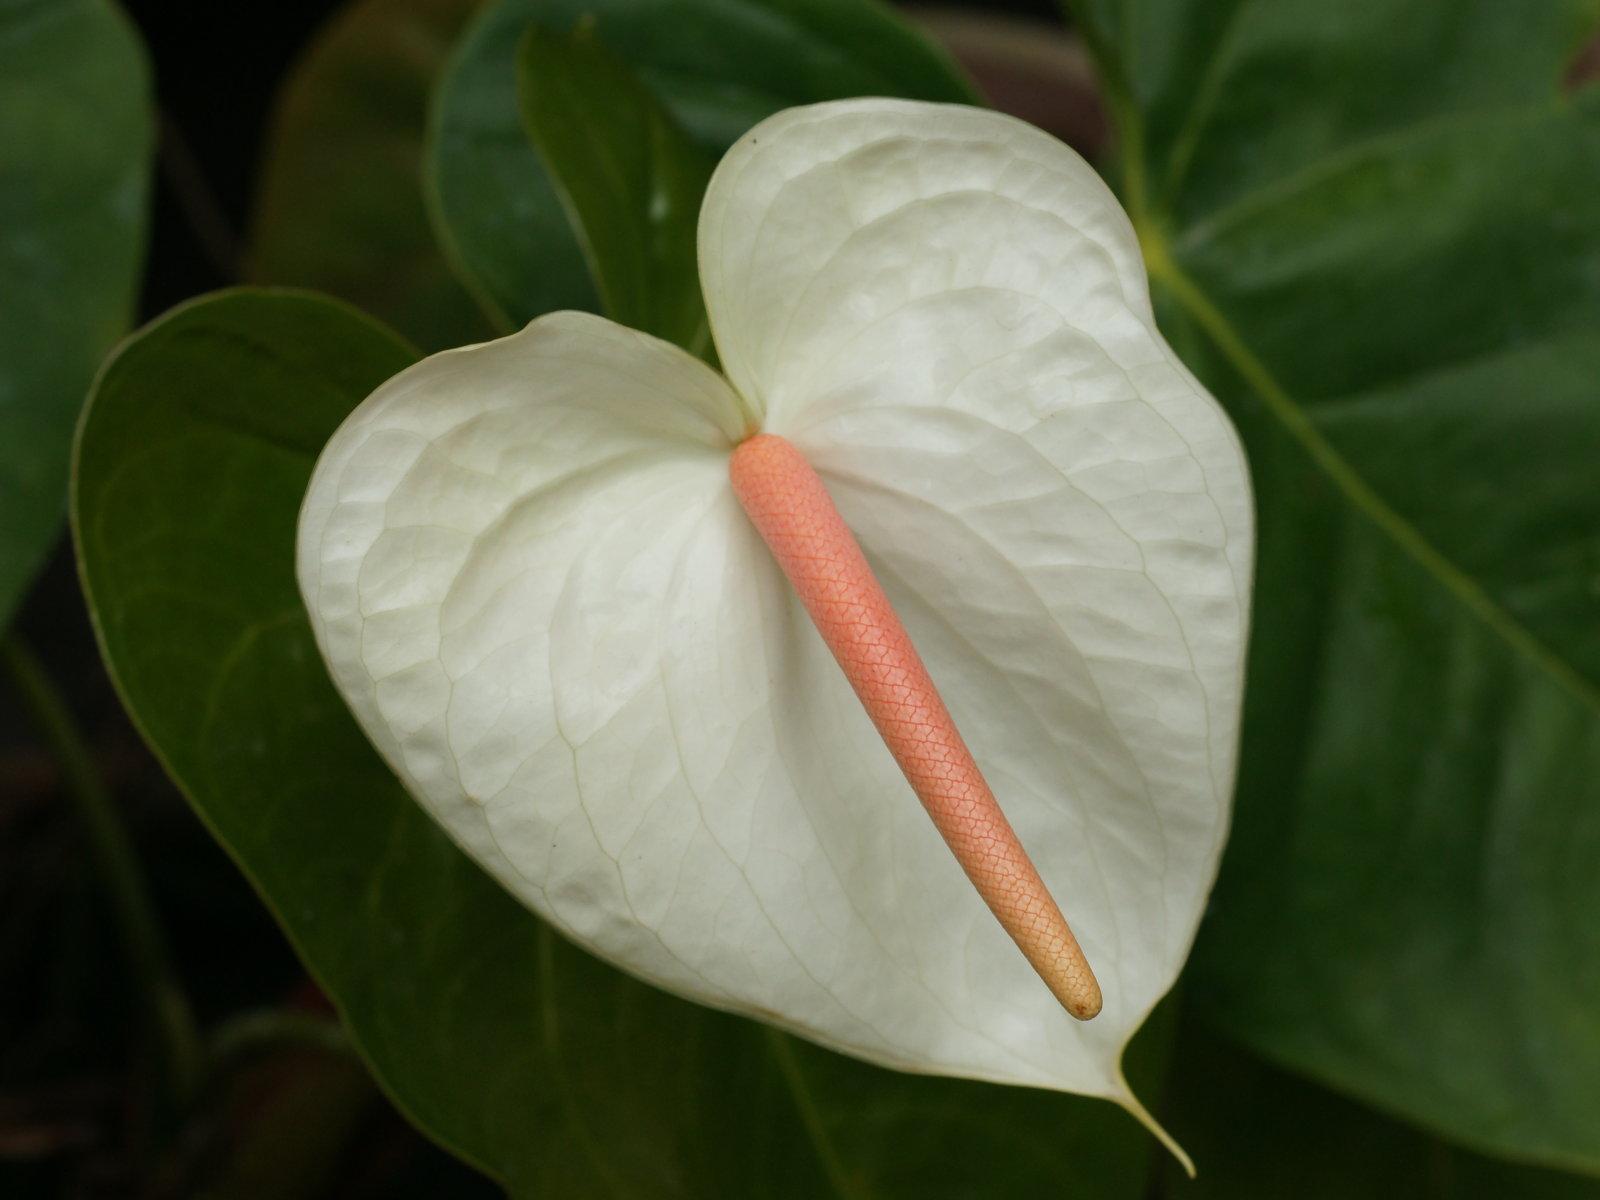 Anthurium Floralife Sdn Bhd